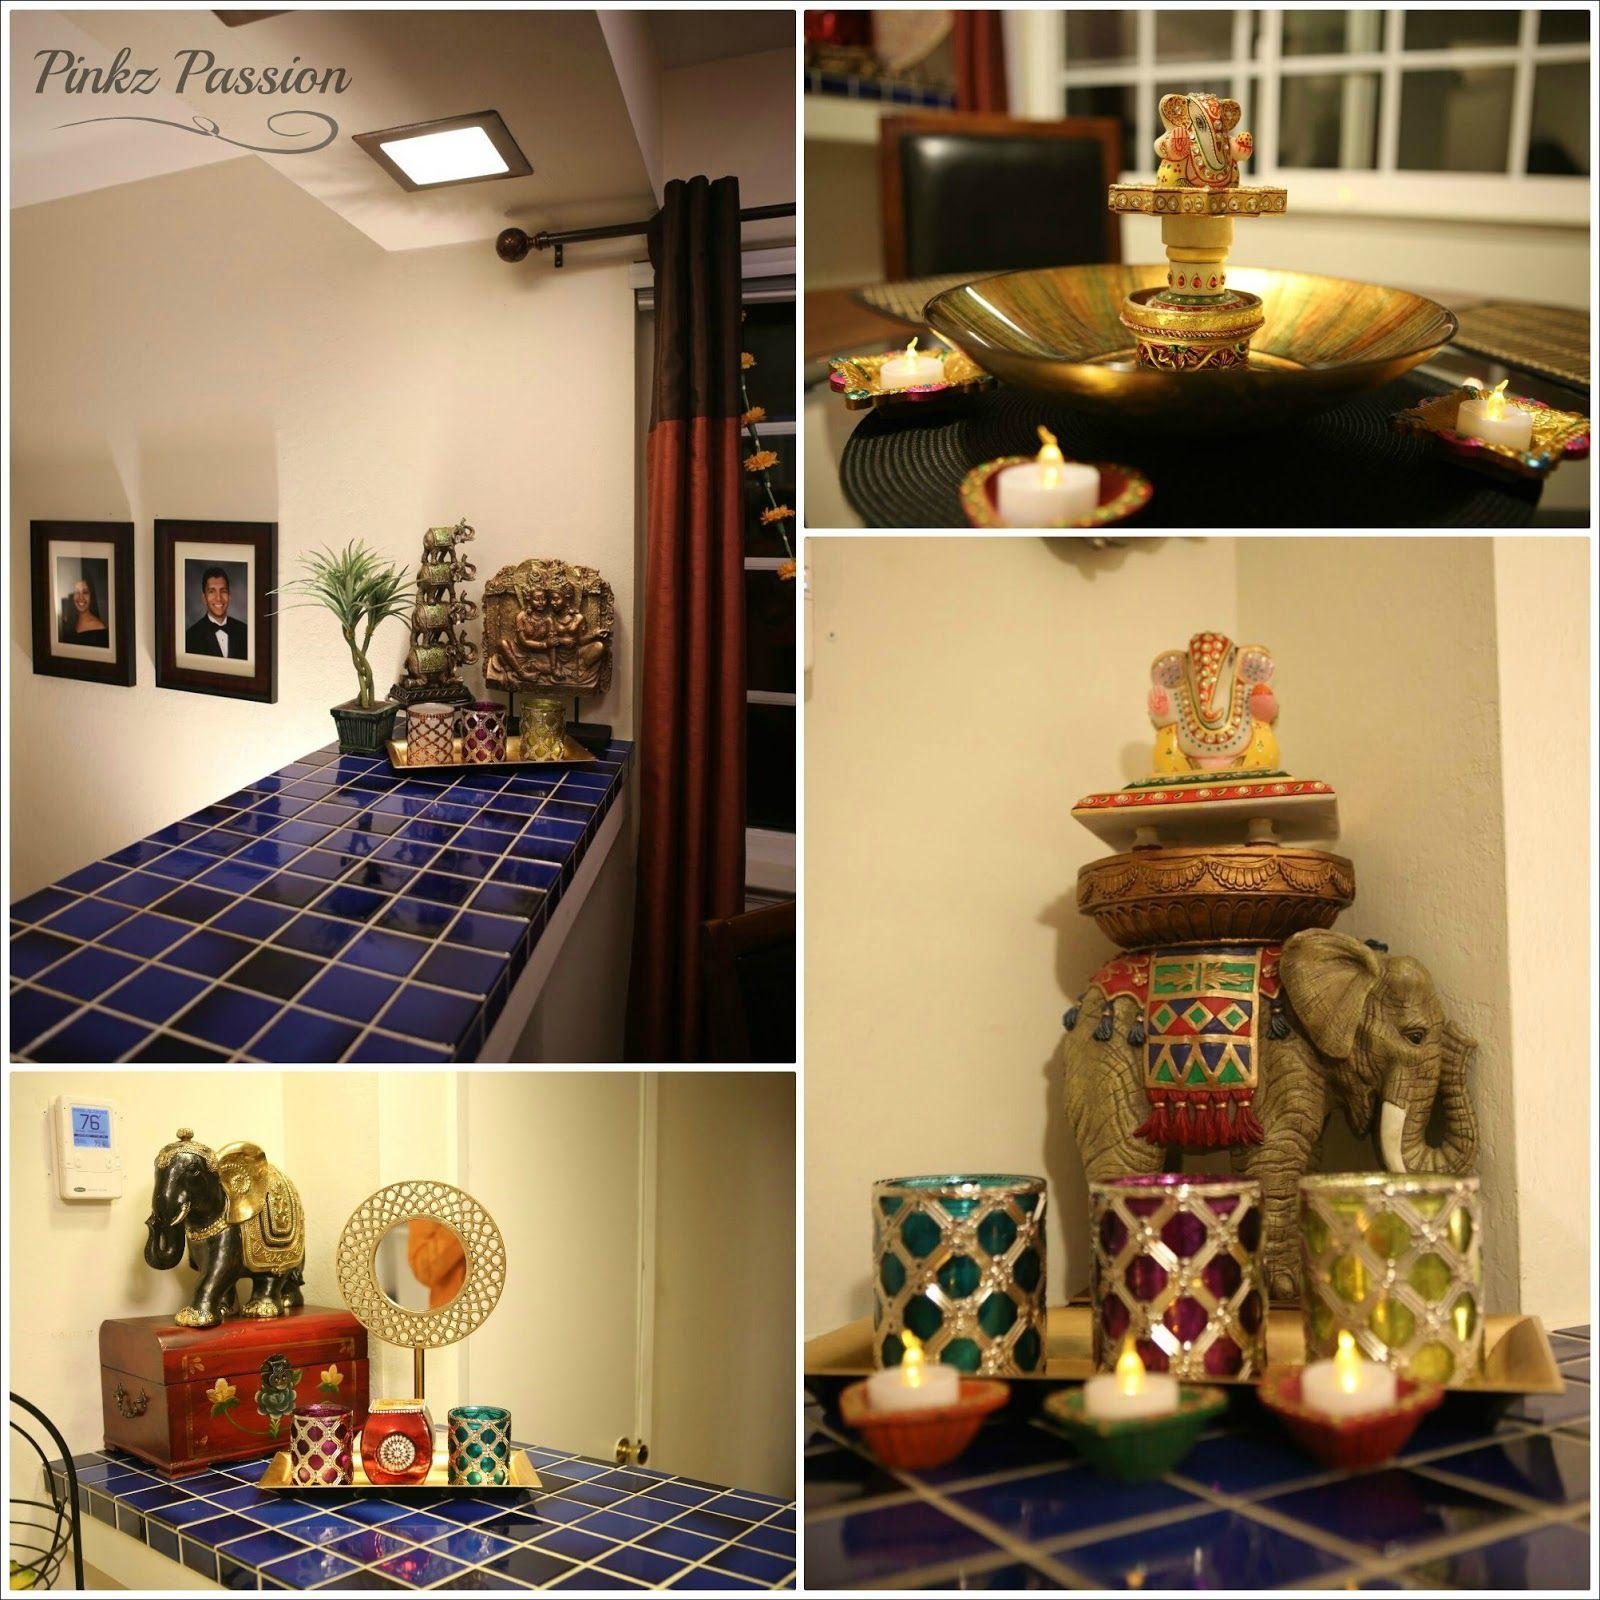 Pin By K Sunitha Menon On For Kerala House Pinterest House Tours